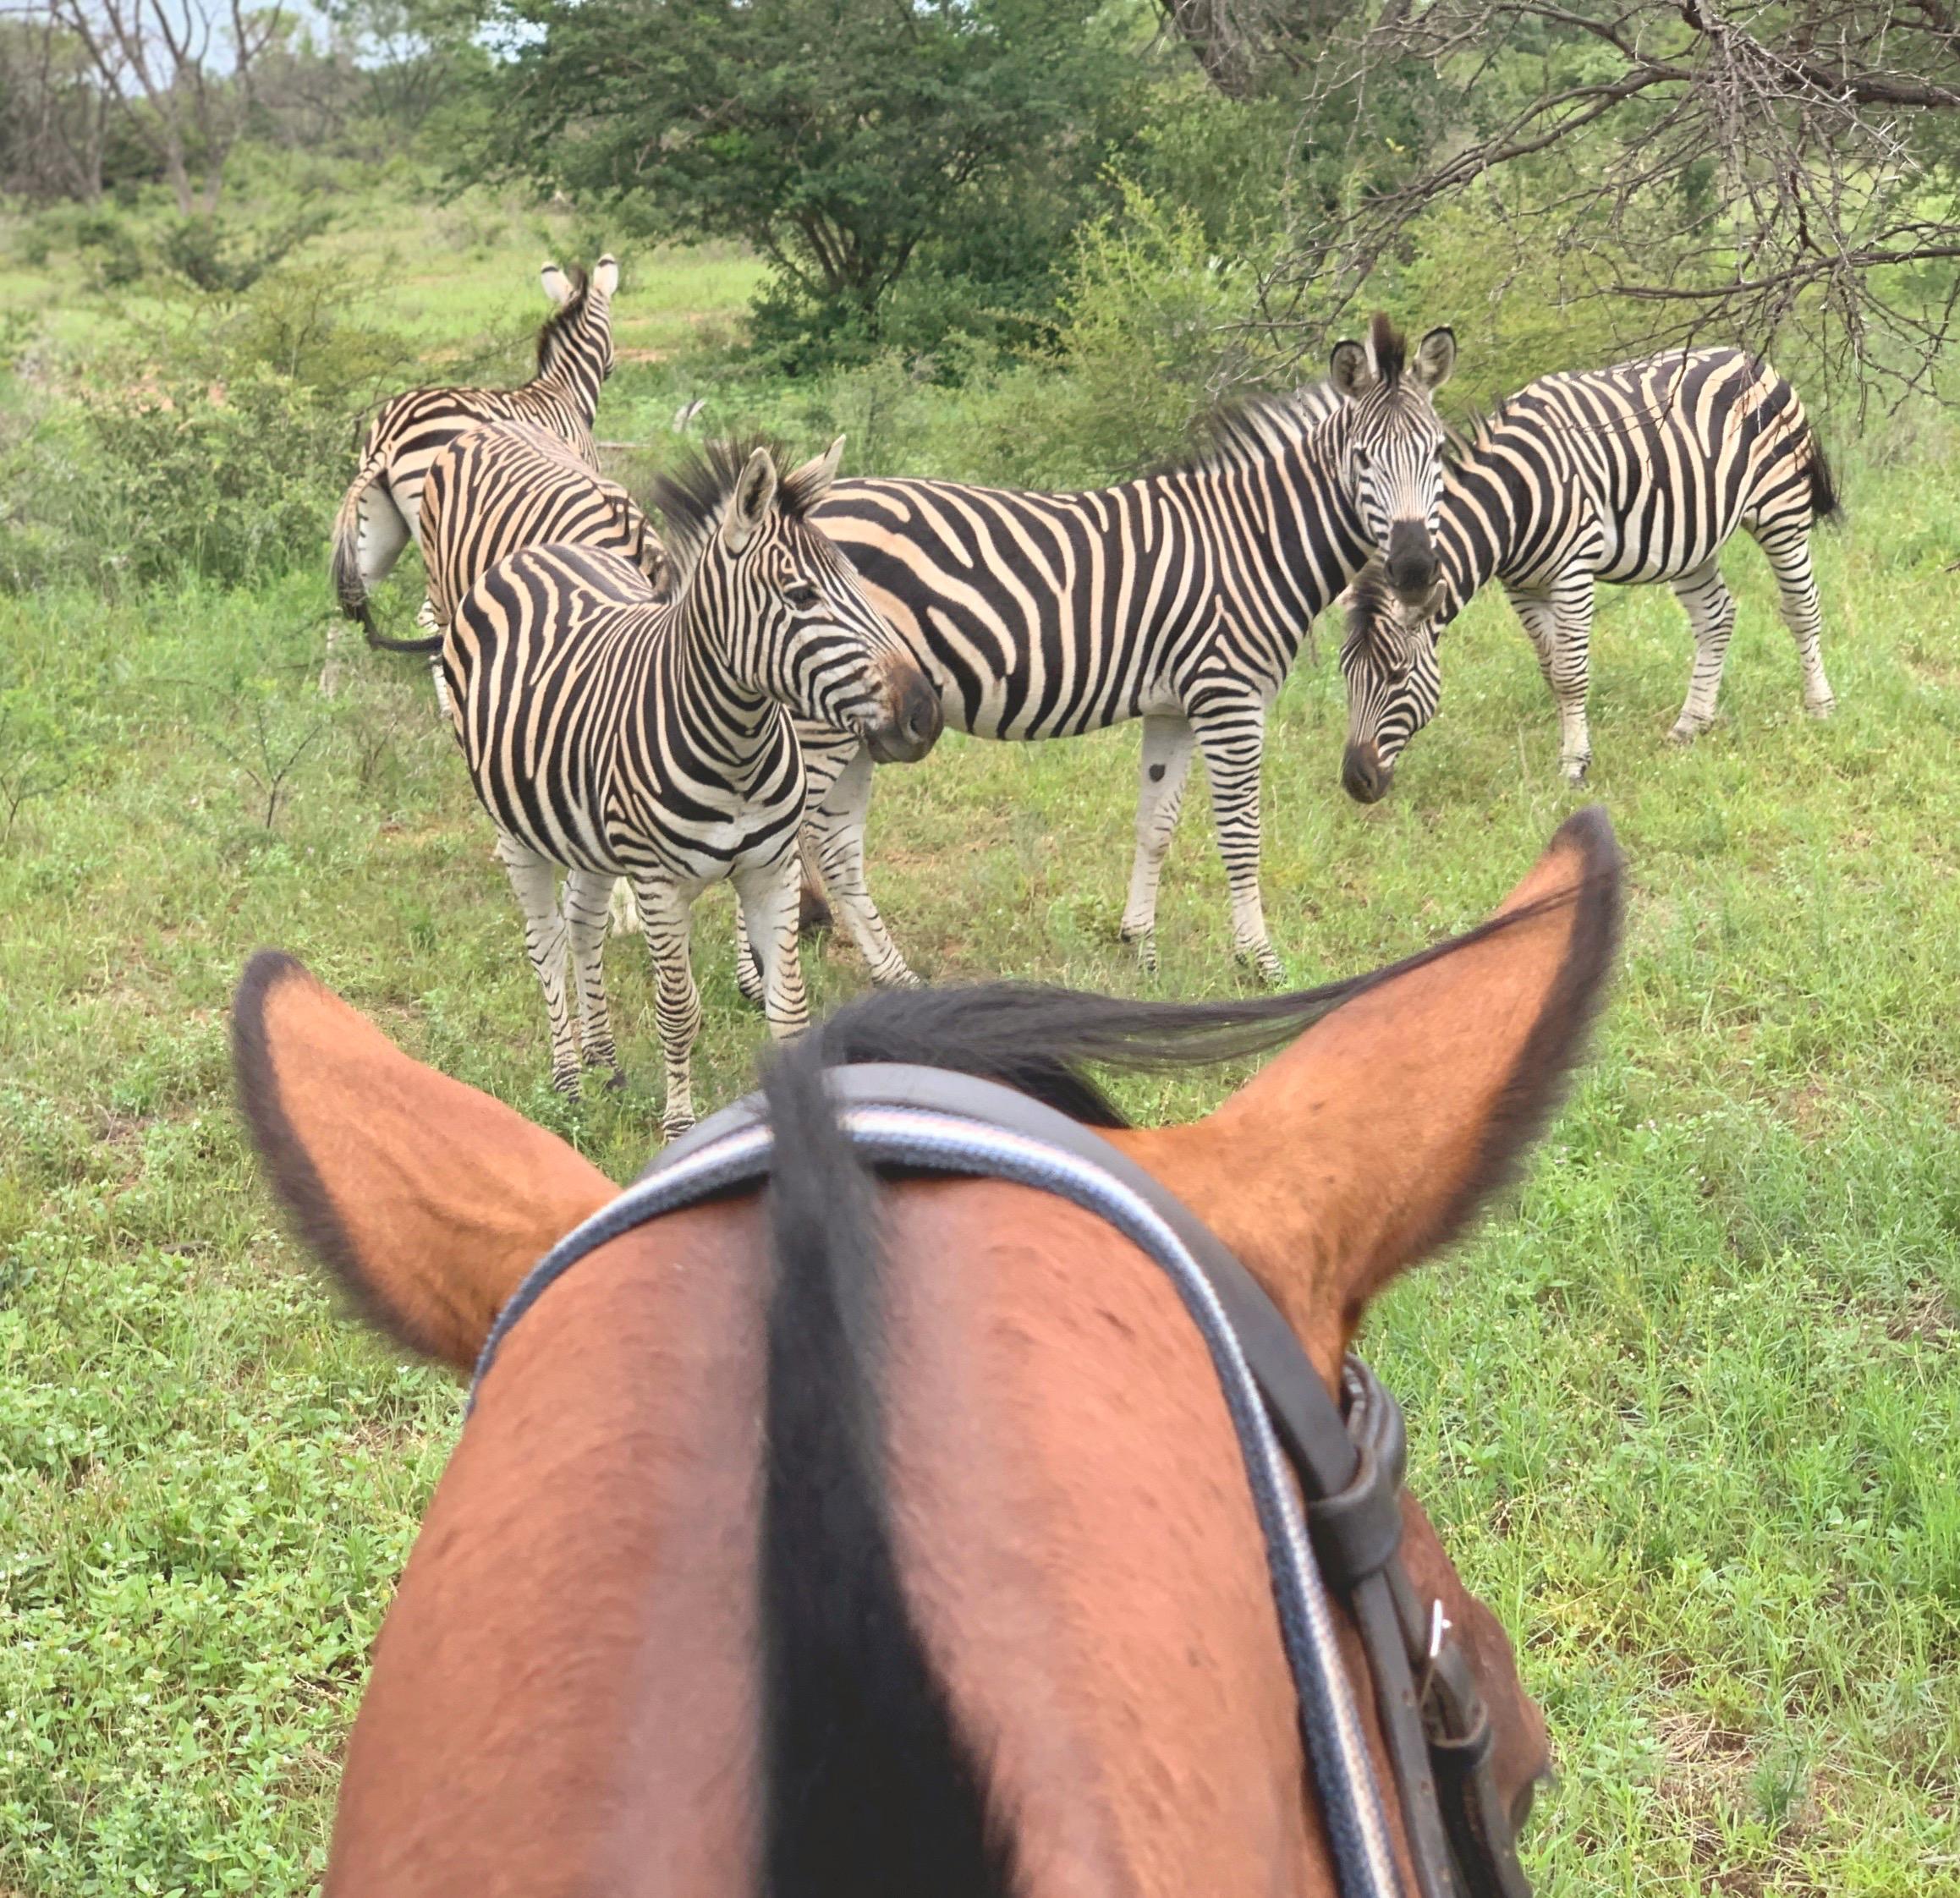 Riding with Zebras